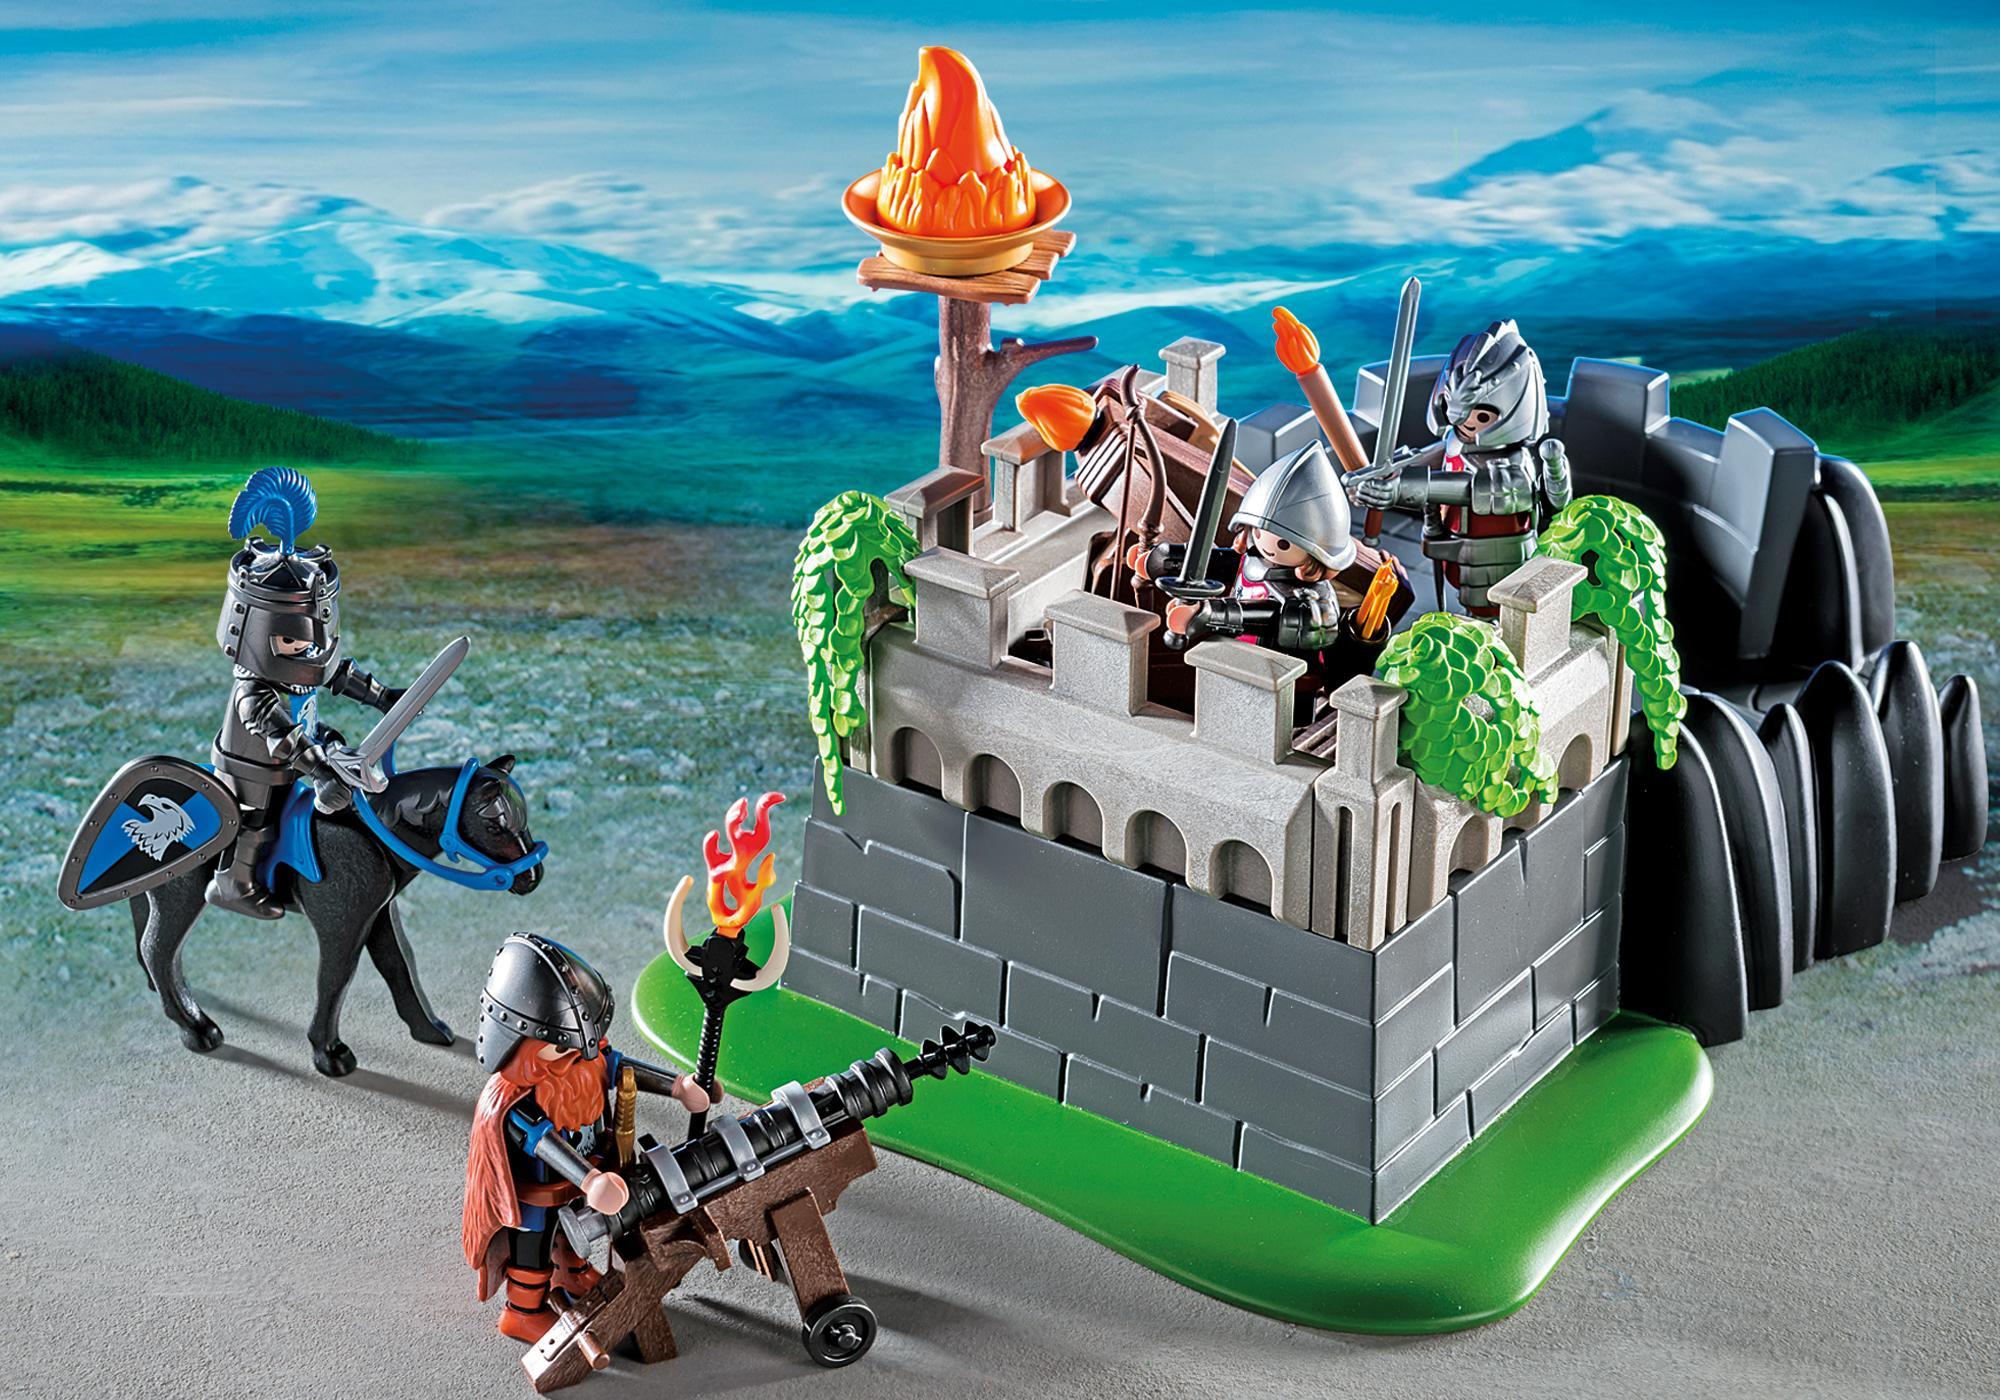 http://media.playmobil.com/i/playmobil/6627_product_extra2/Bastion smoczych rycerzy